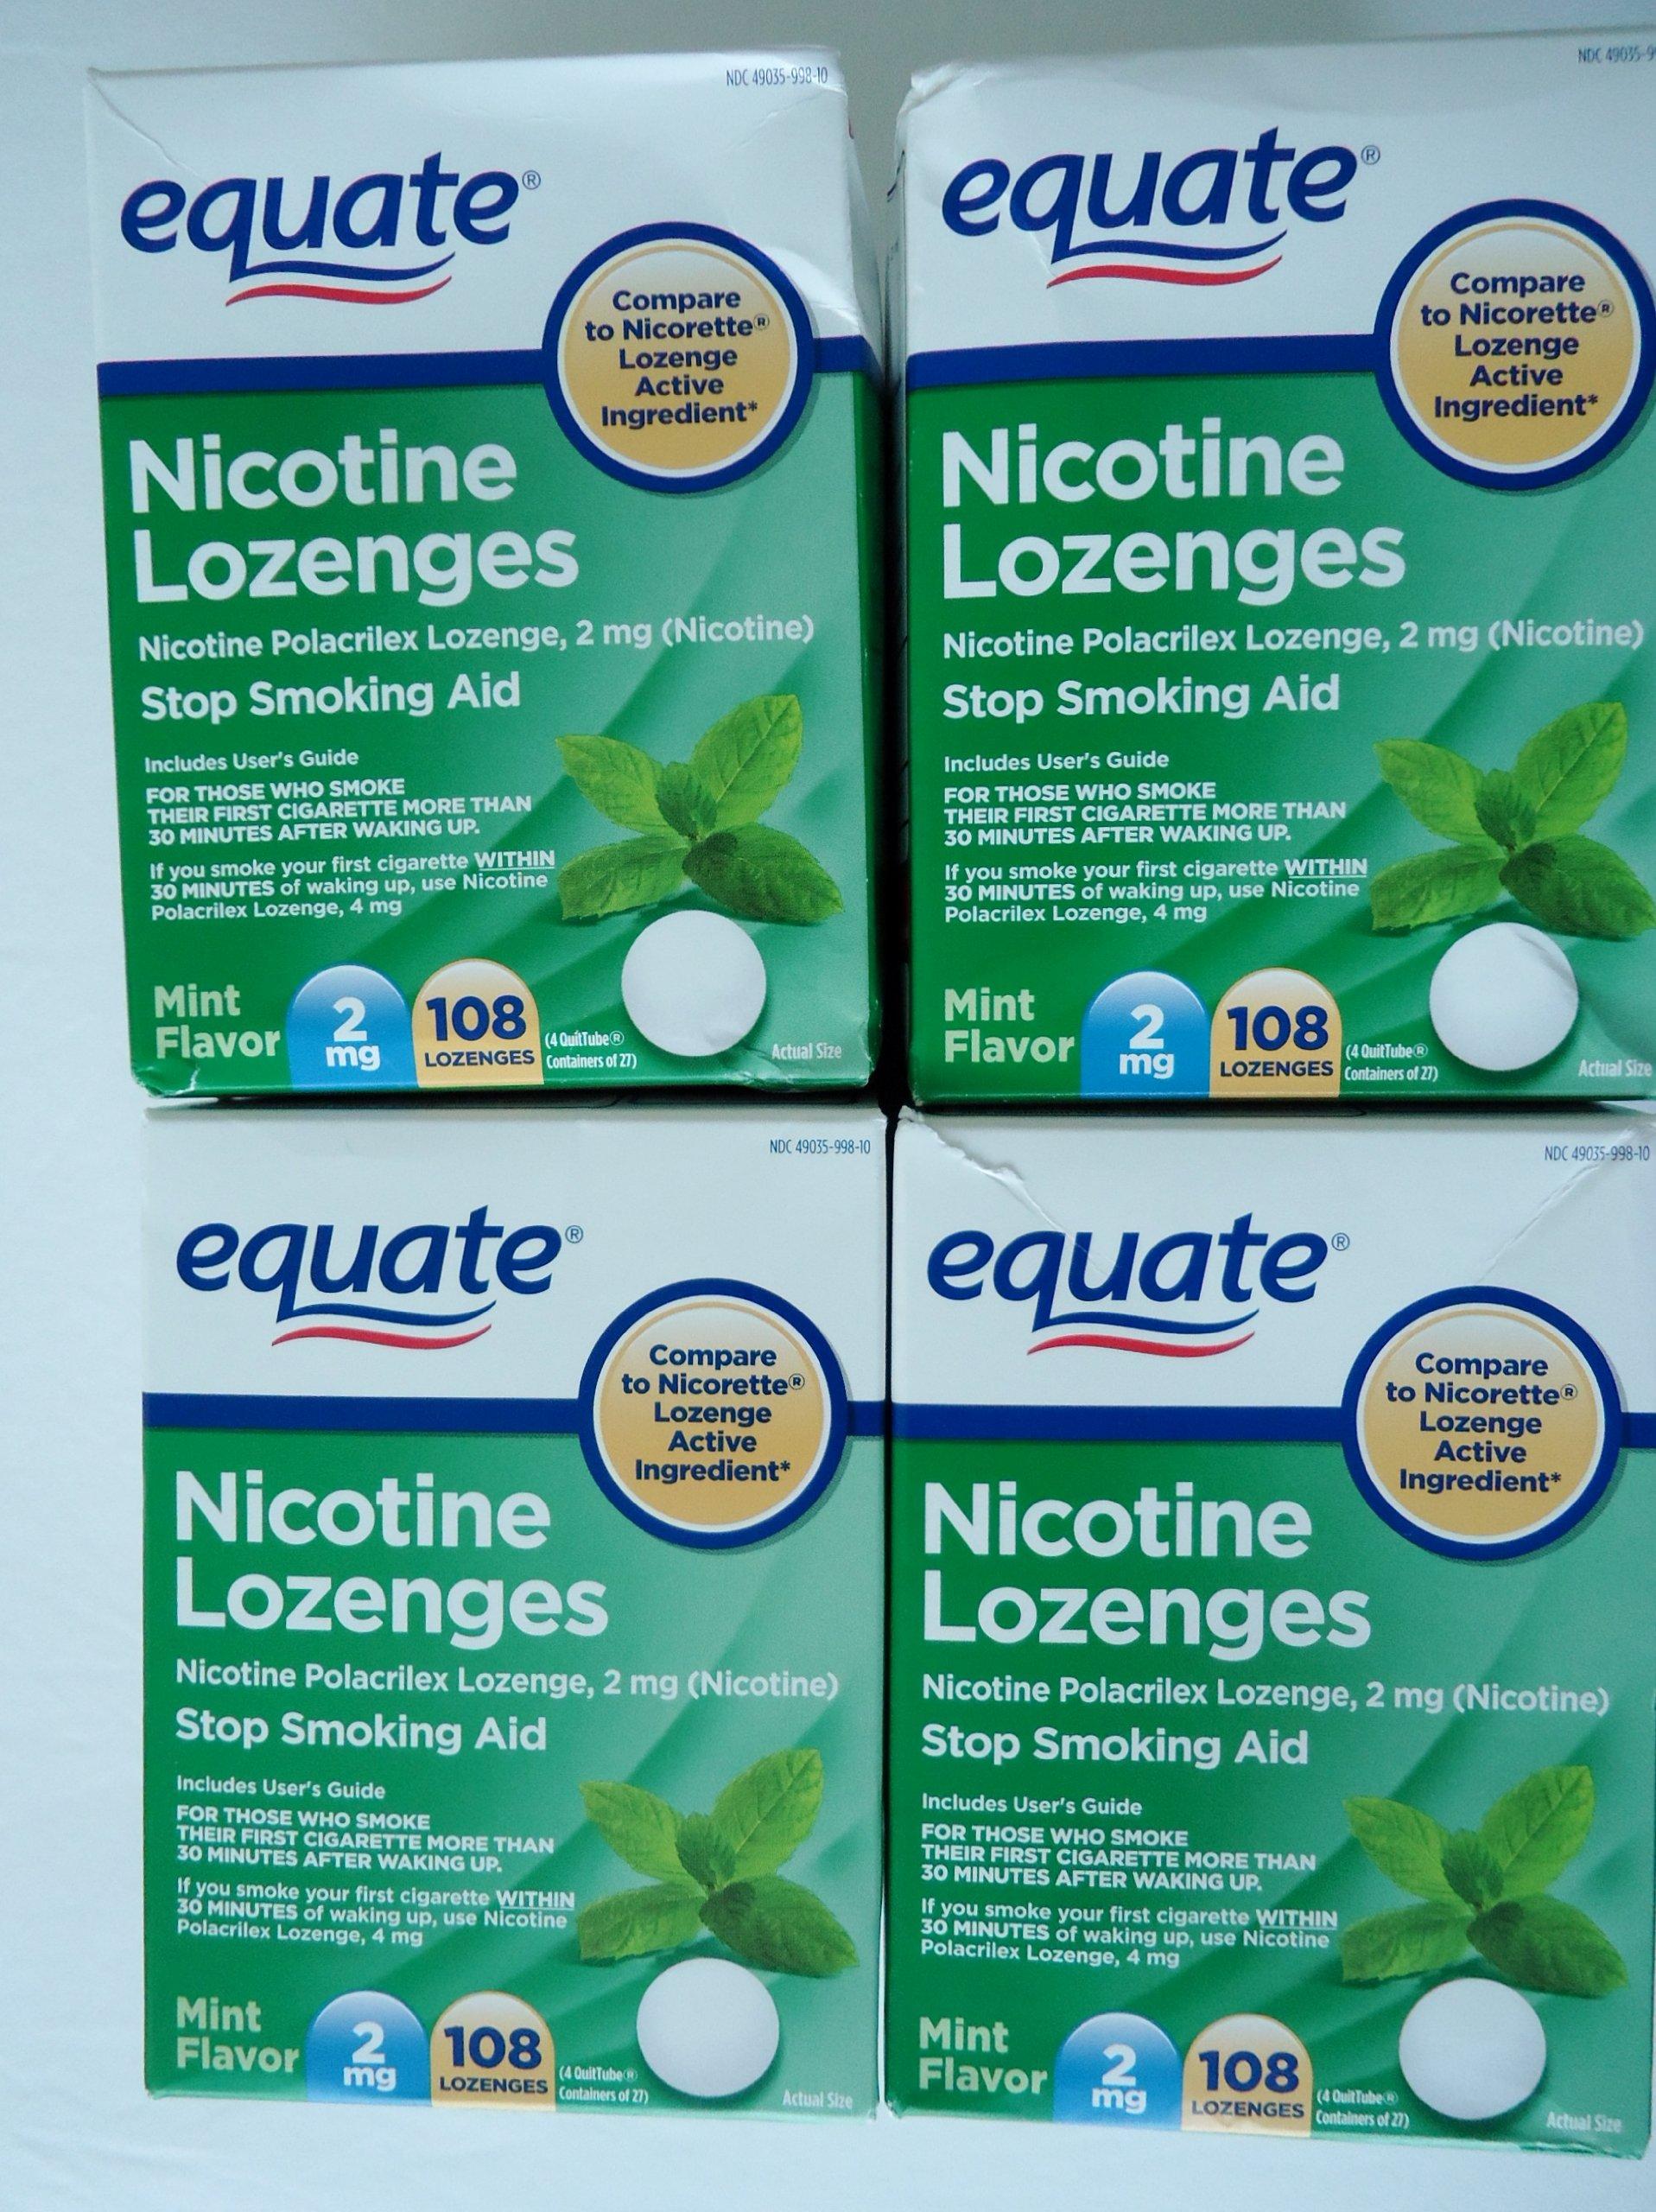 Equate - Nicotine Lozenge 2 mg, Mint Flavor, 108 Lozenges,PACK OF 4